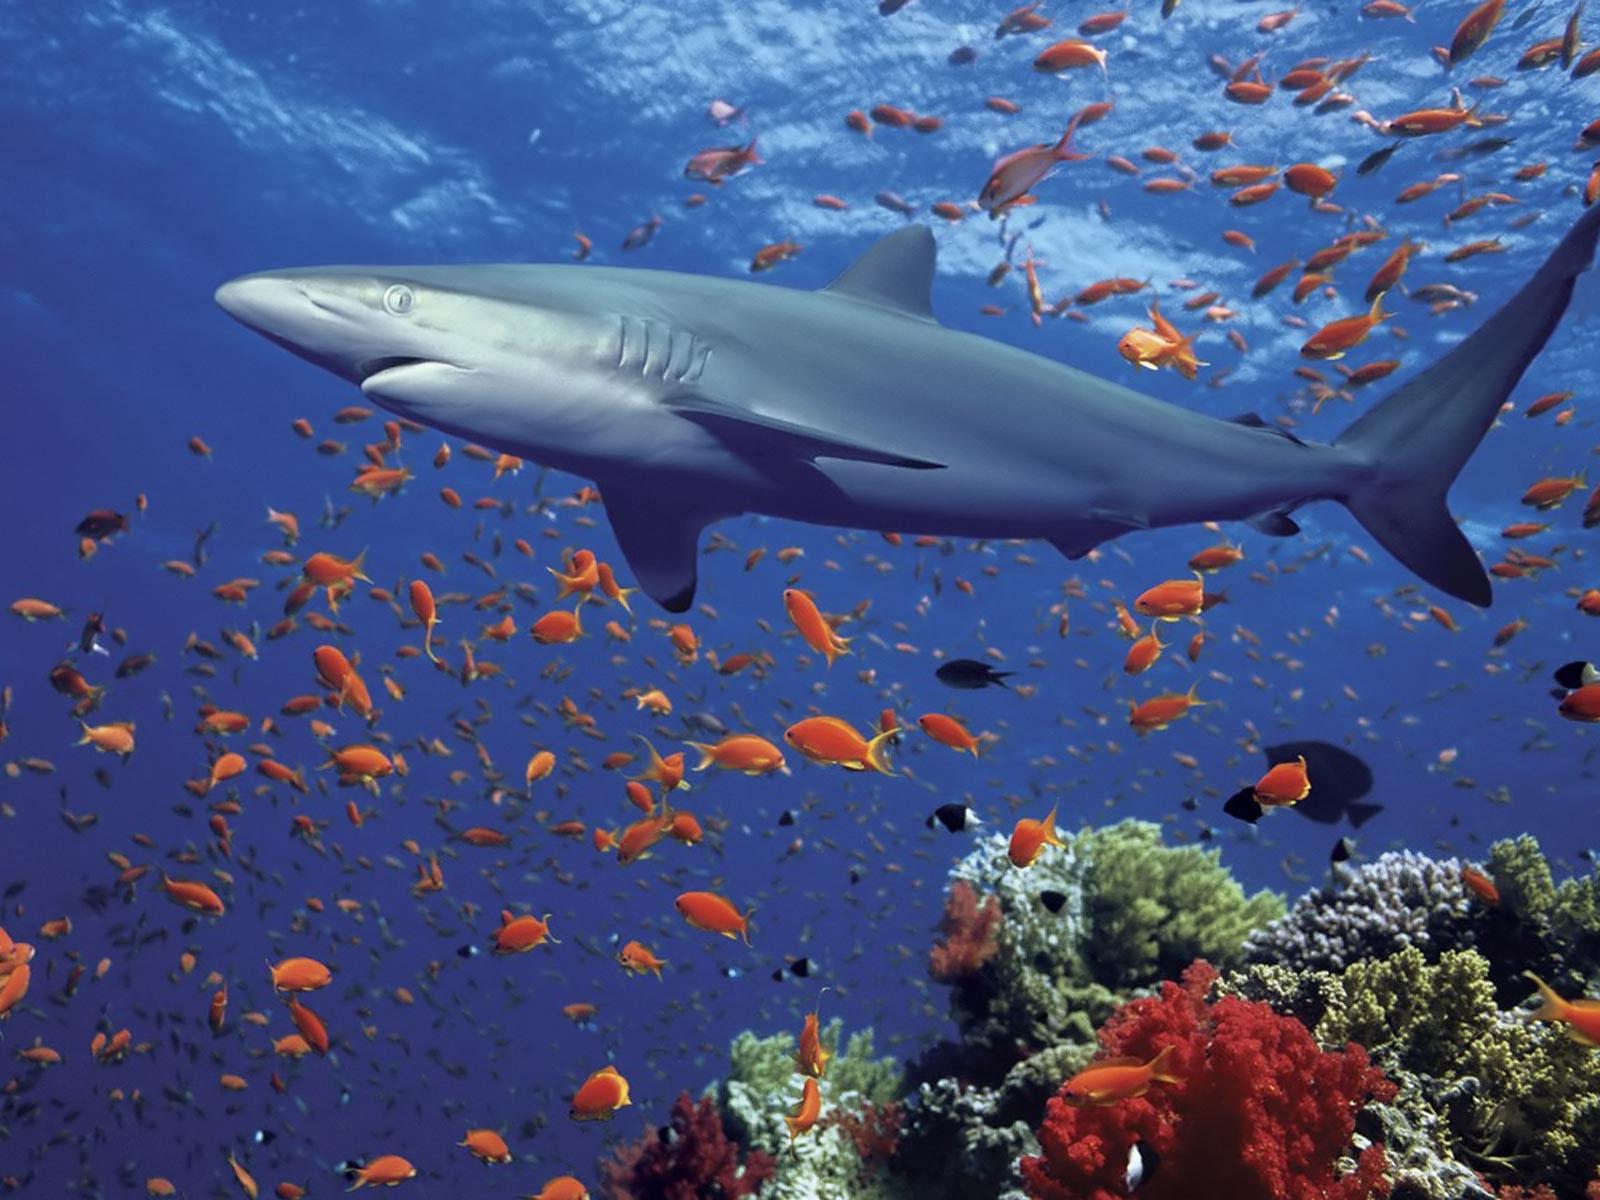 Shark Wallpaper HD Shark Pictures - HD Animal Wallpapers